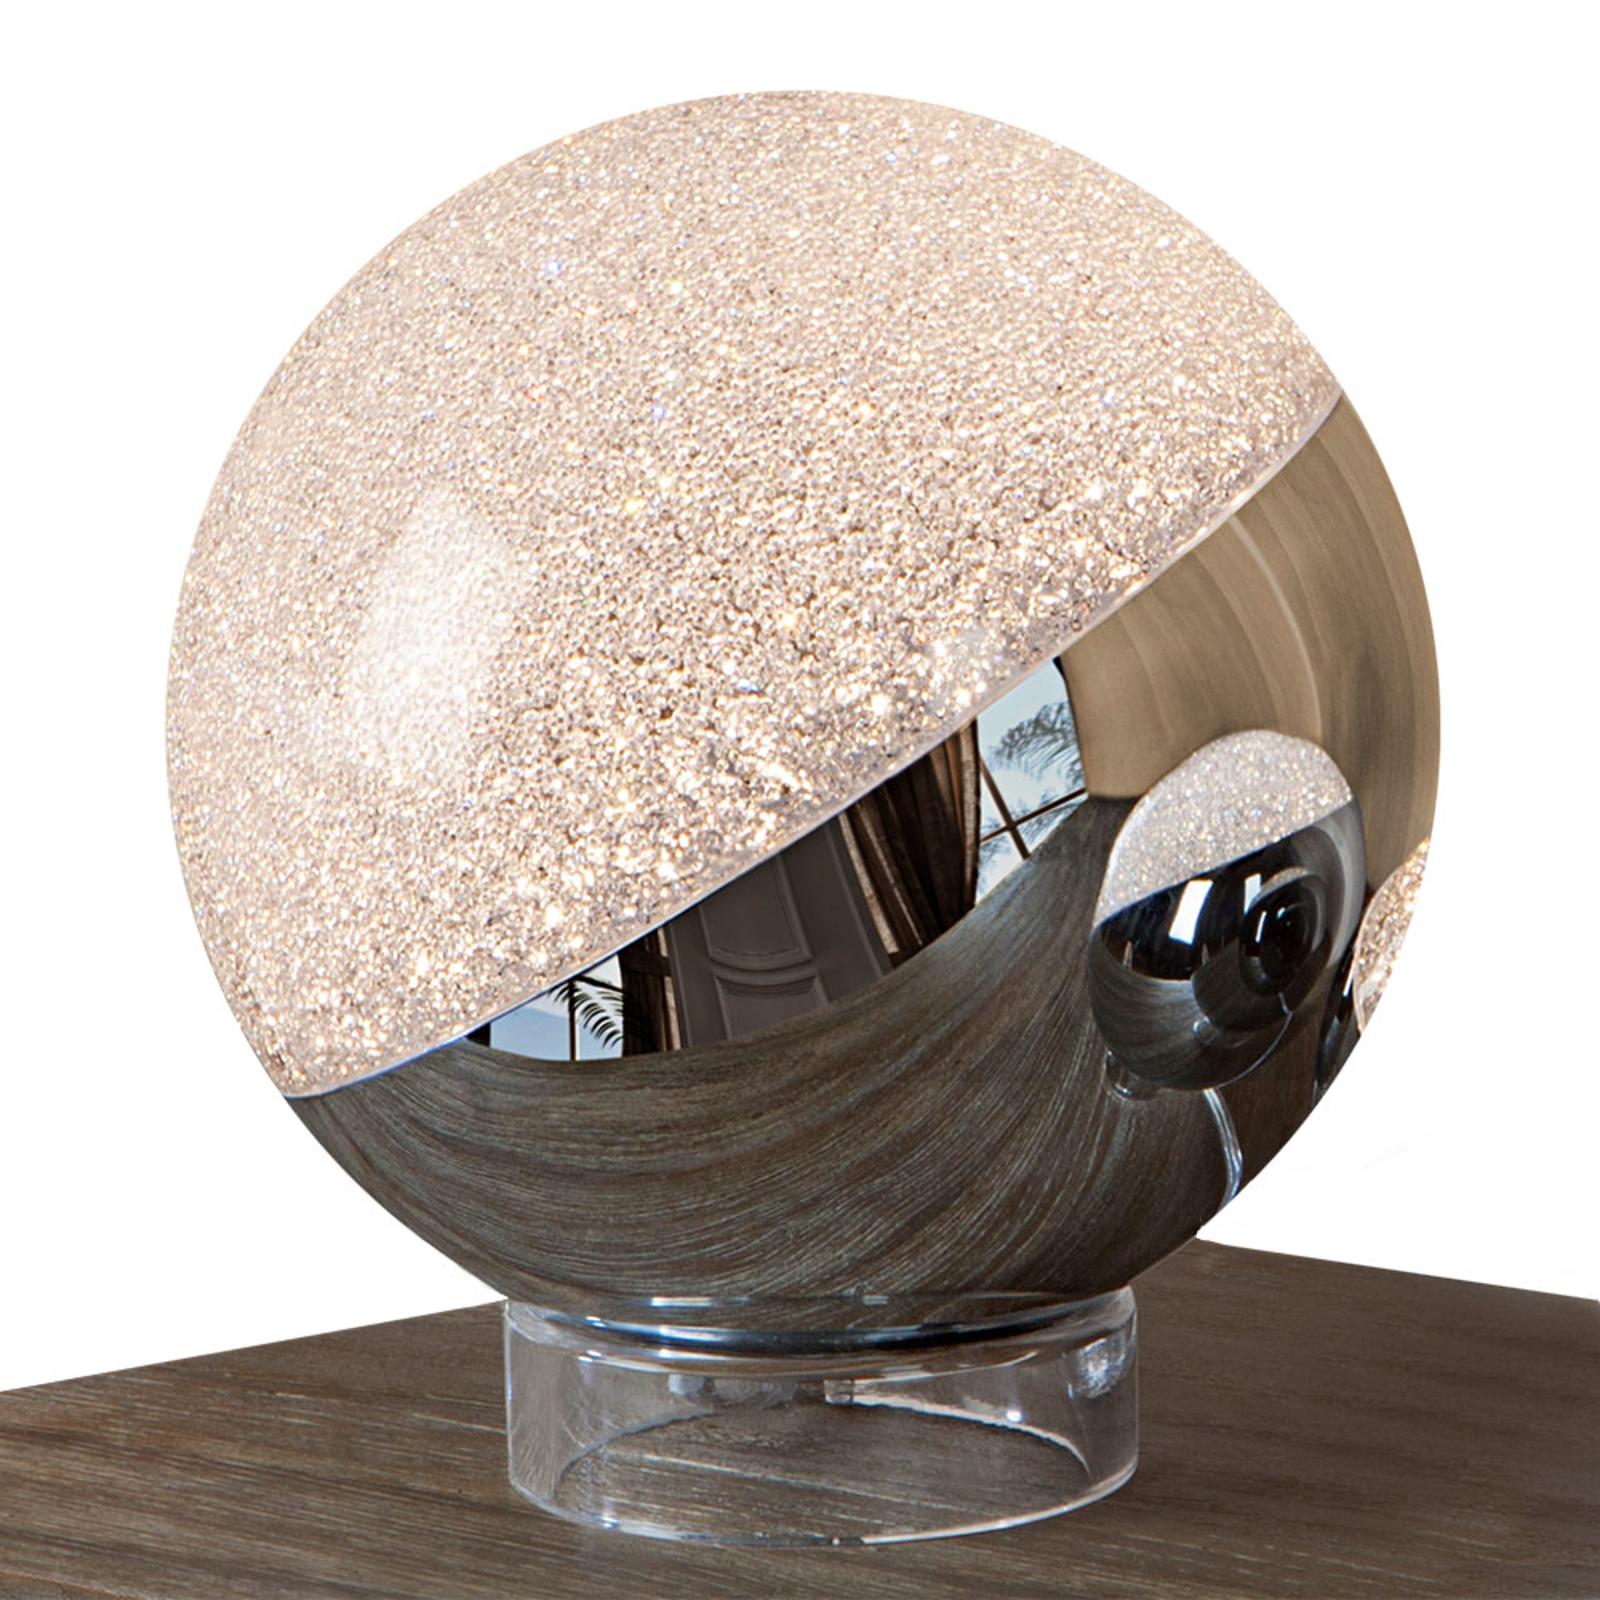 Lampa stołowa LED Sphere, chrom, Ø 20 cm